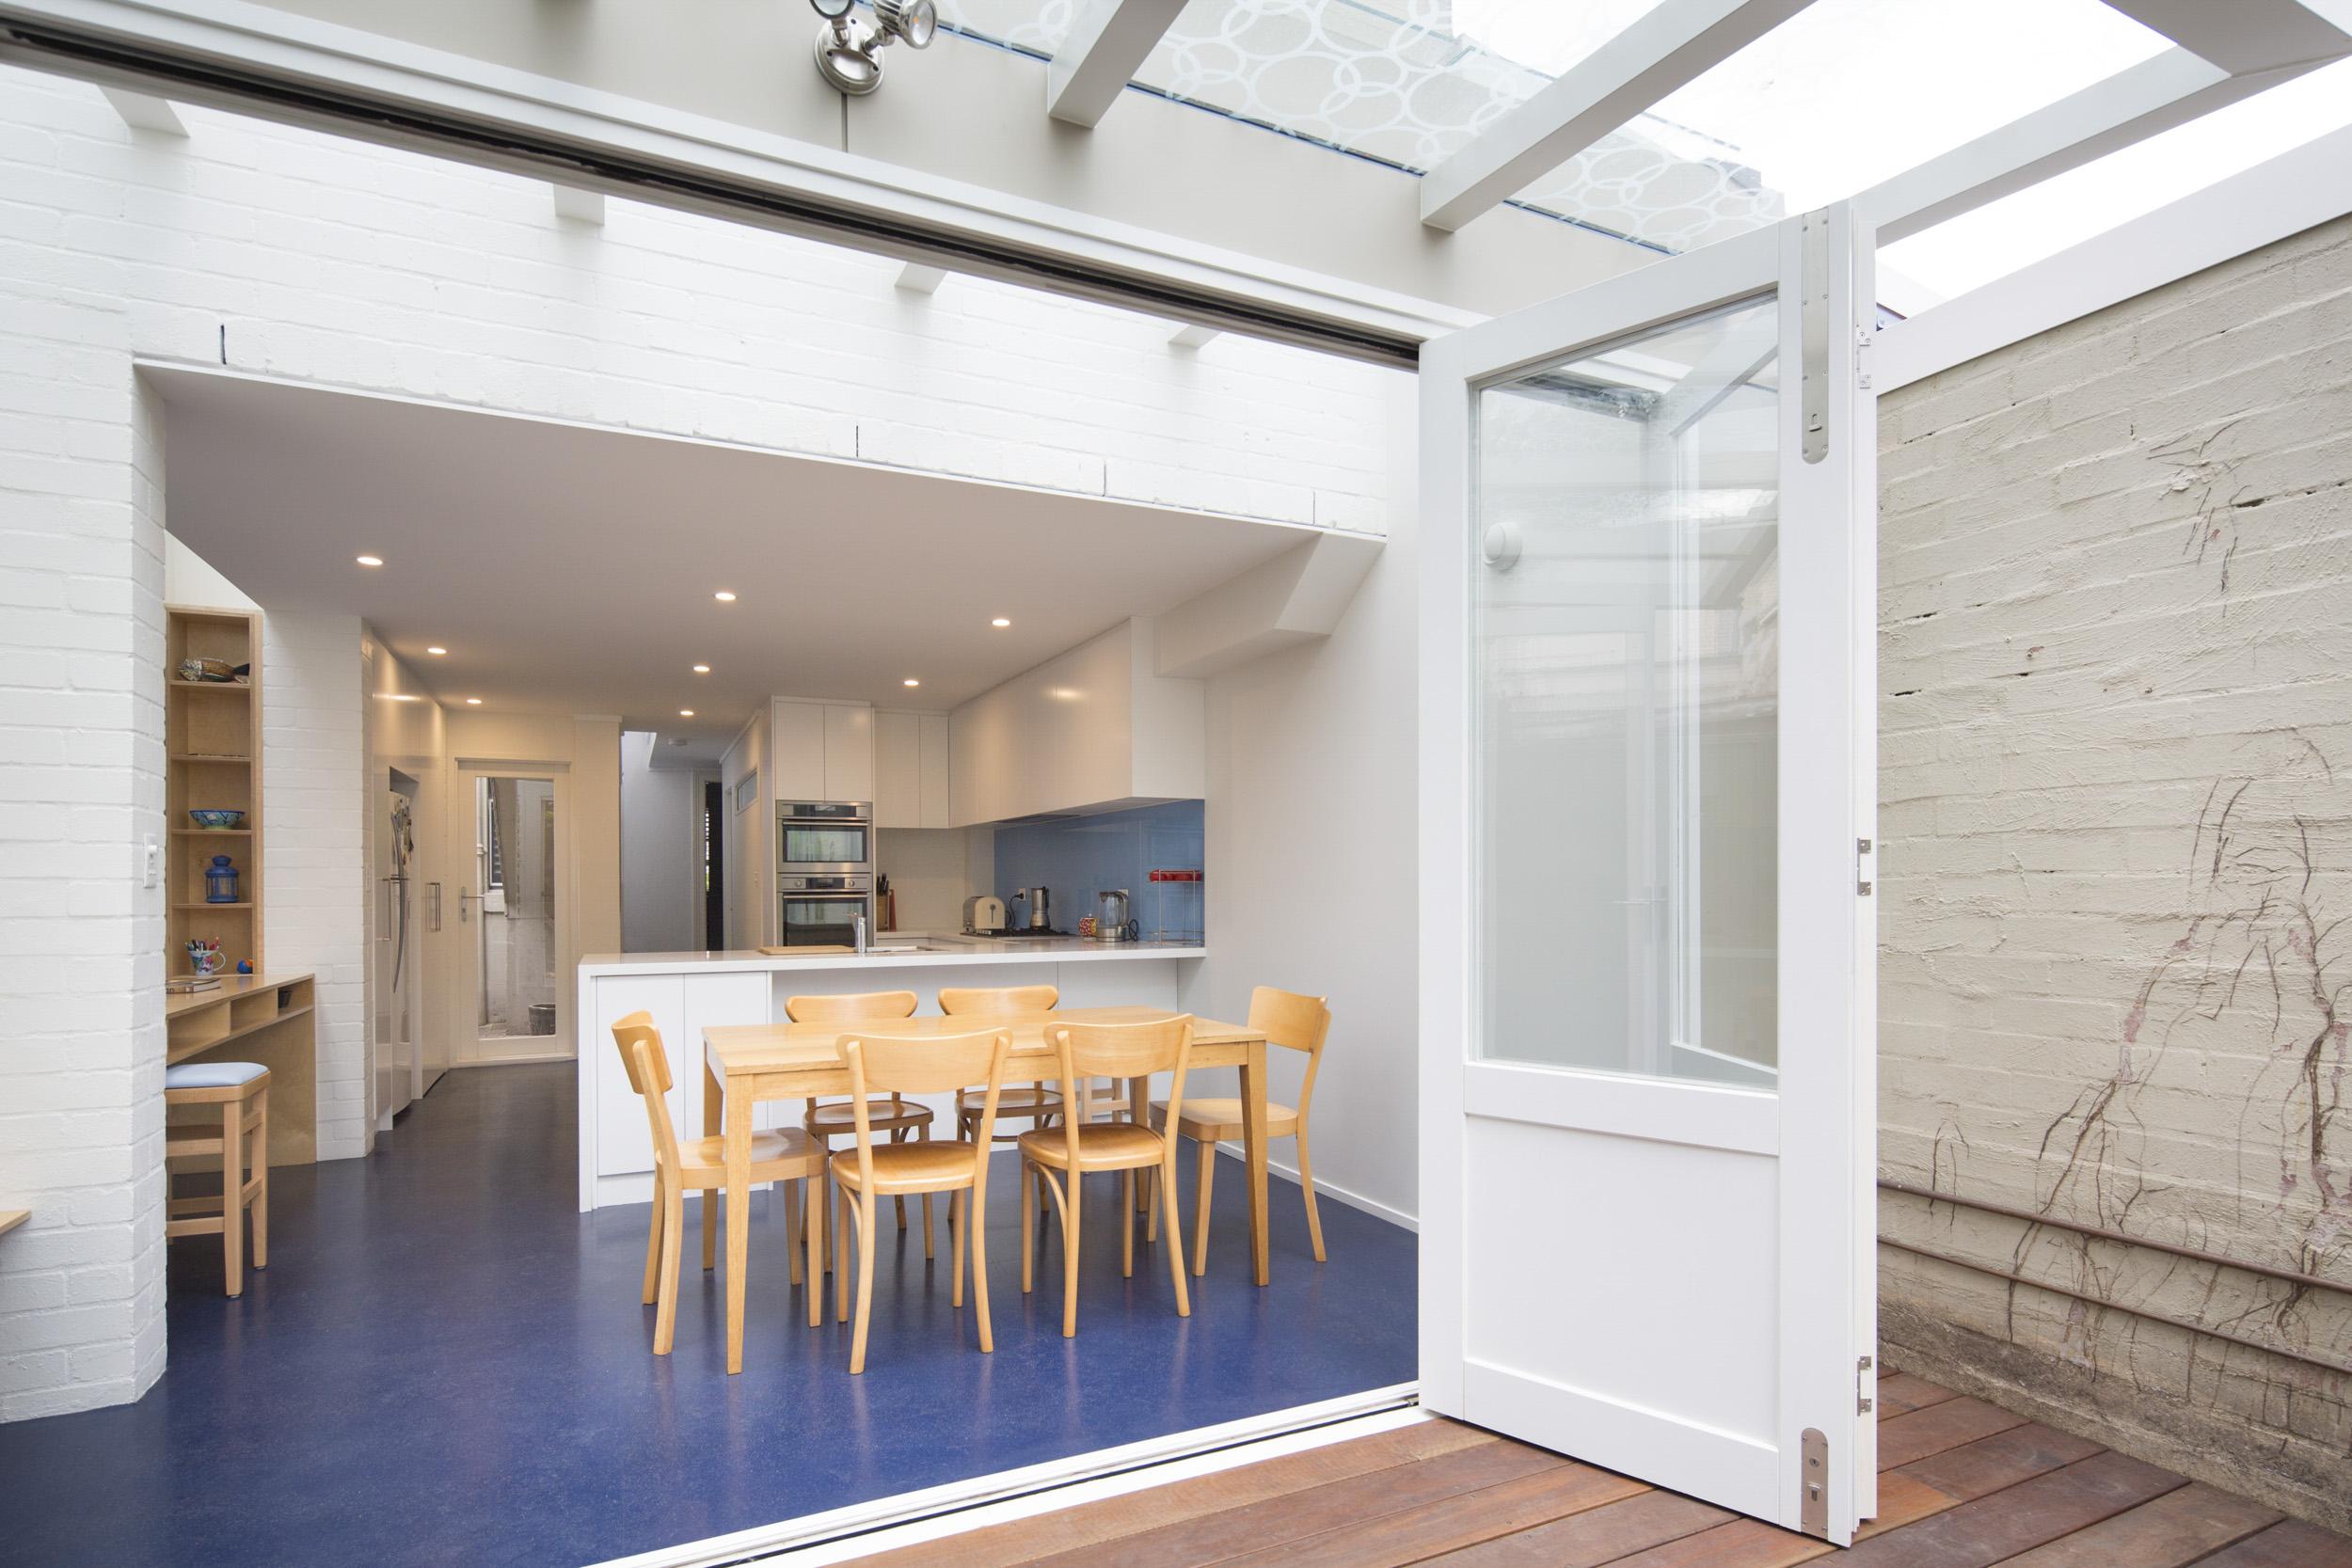 residential_architecture_sydney_australia_05.jpg